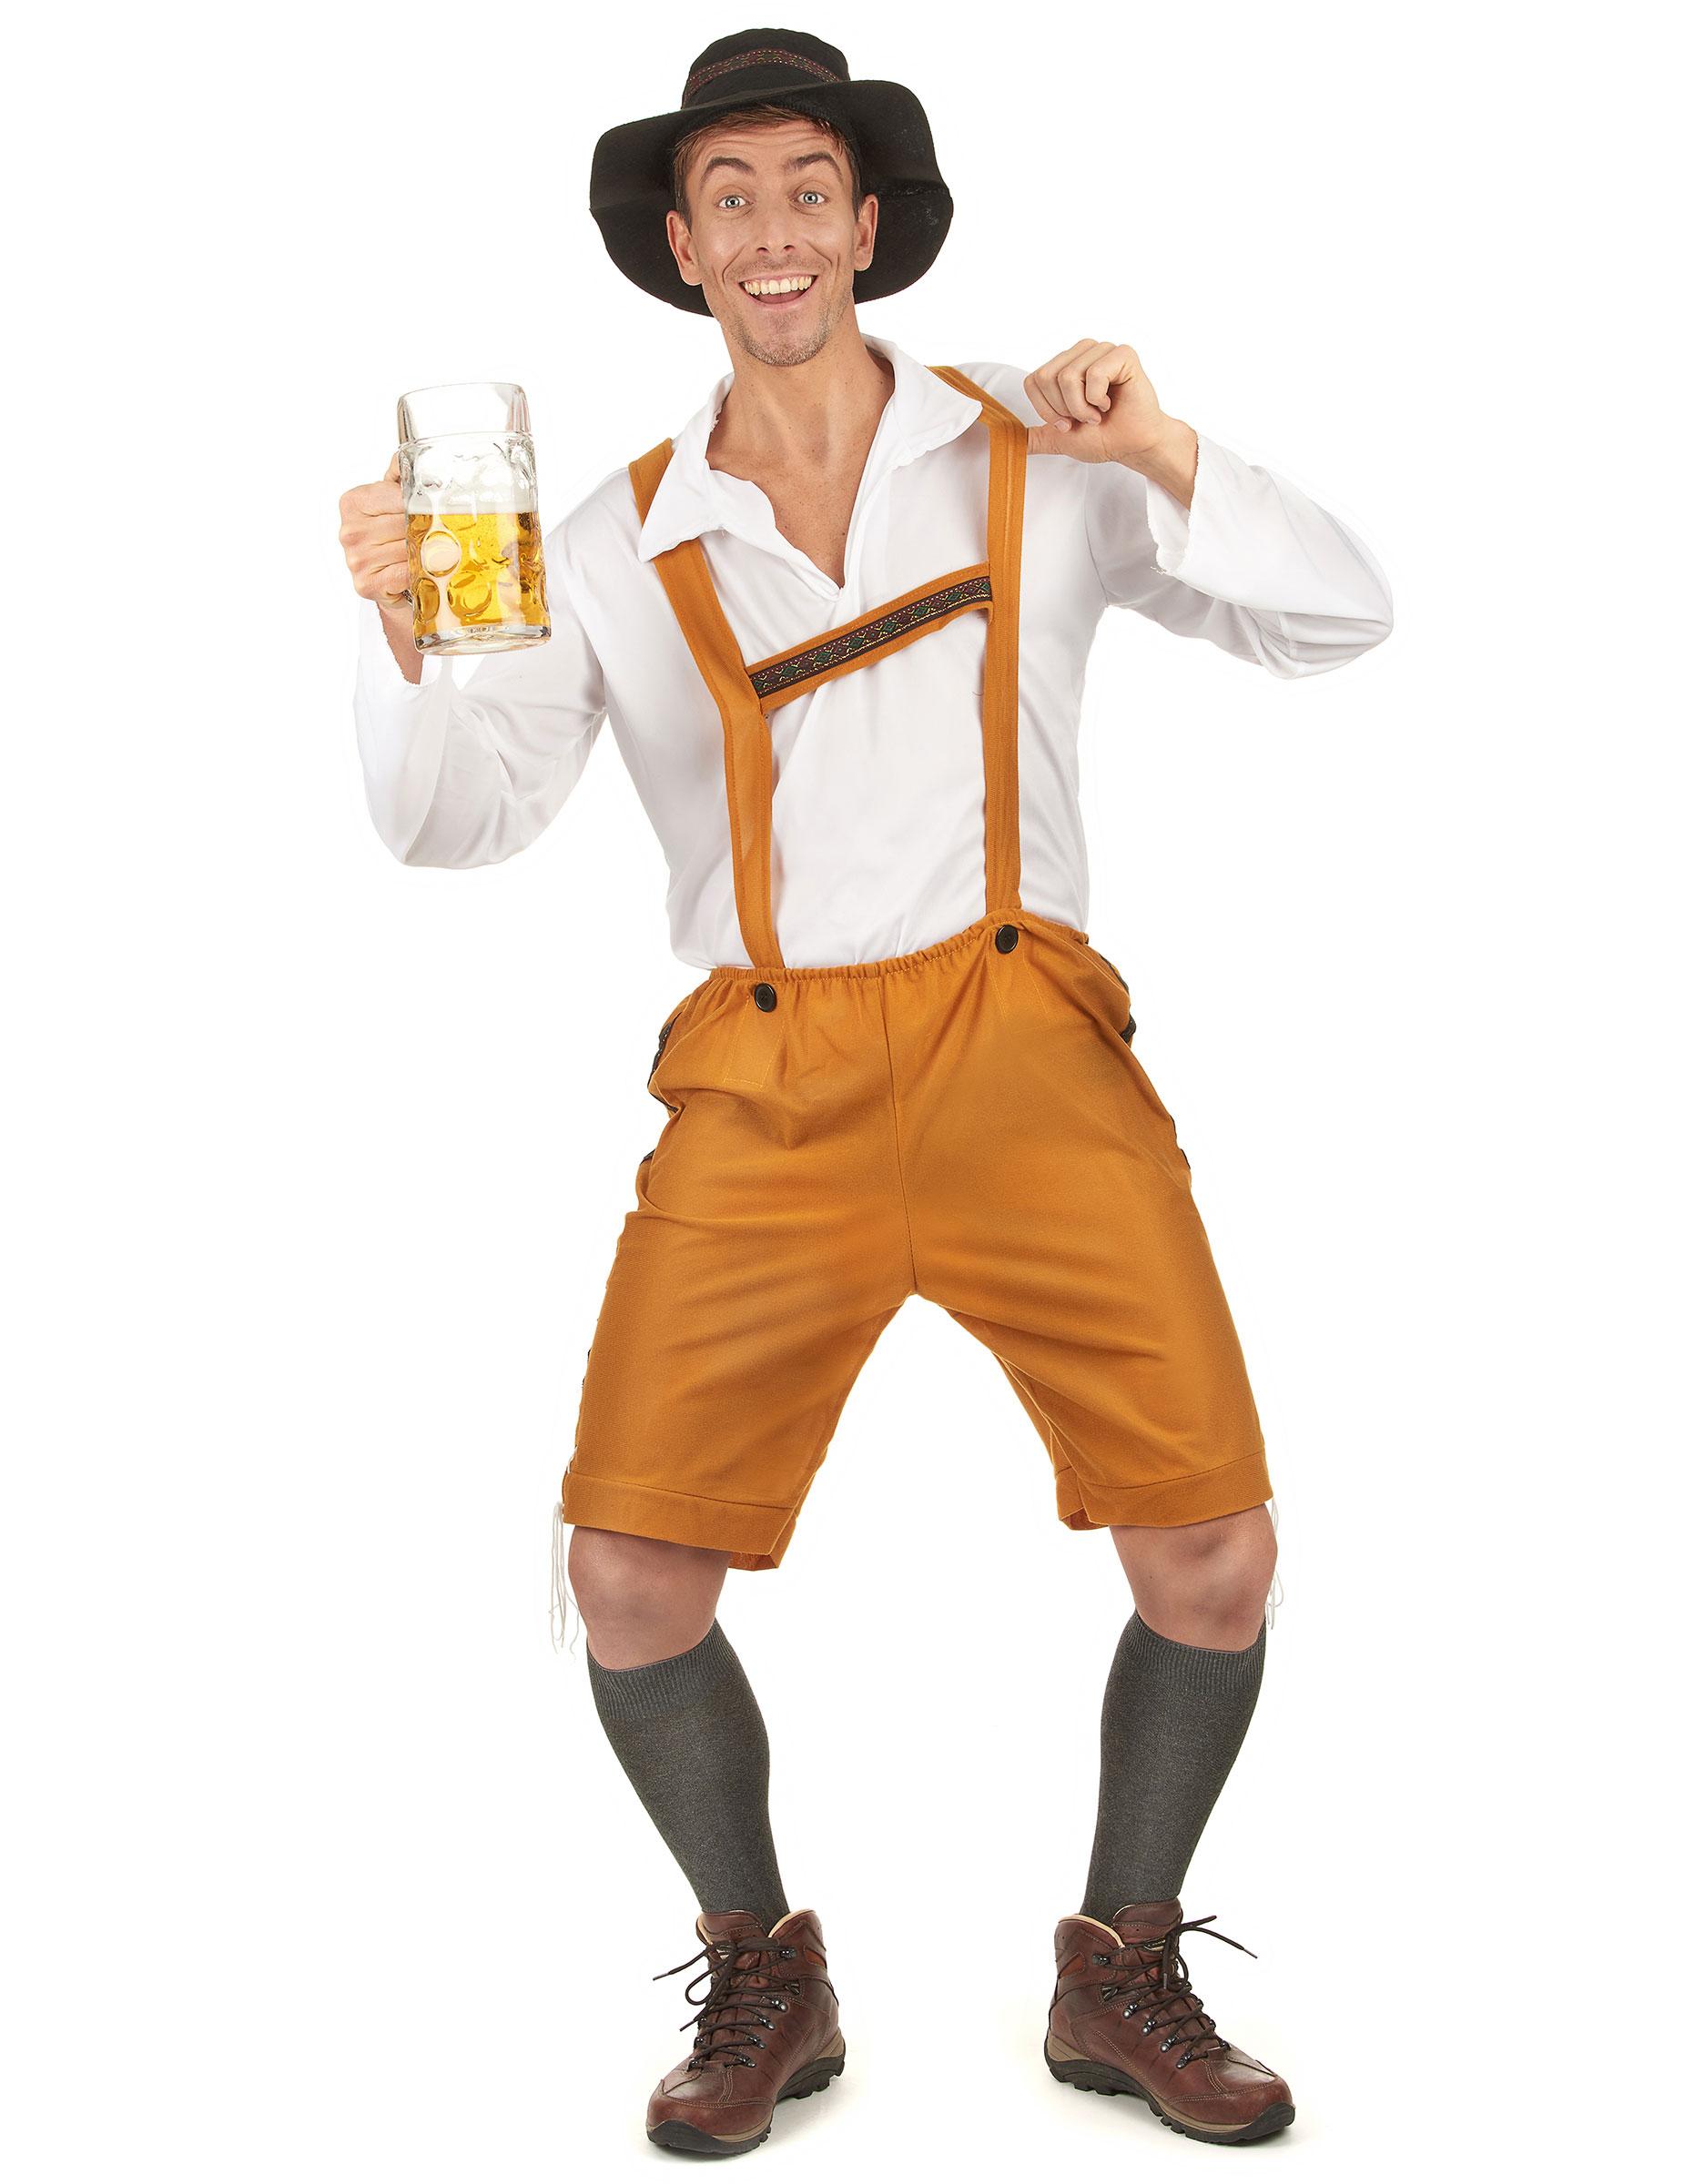 422508954862 Costumi Oktoberfest per adulti belli ed economici!